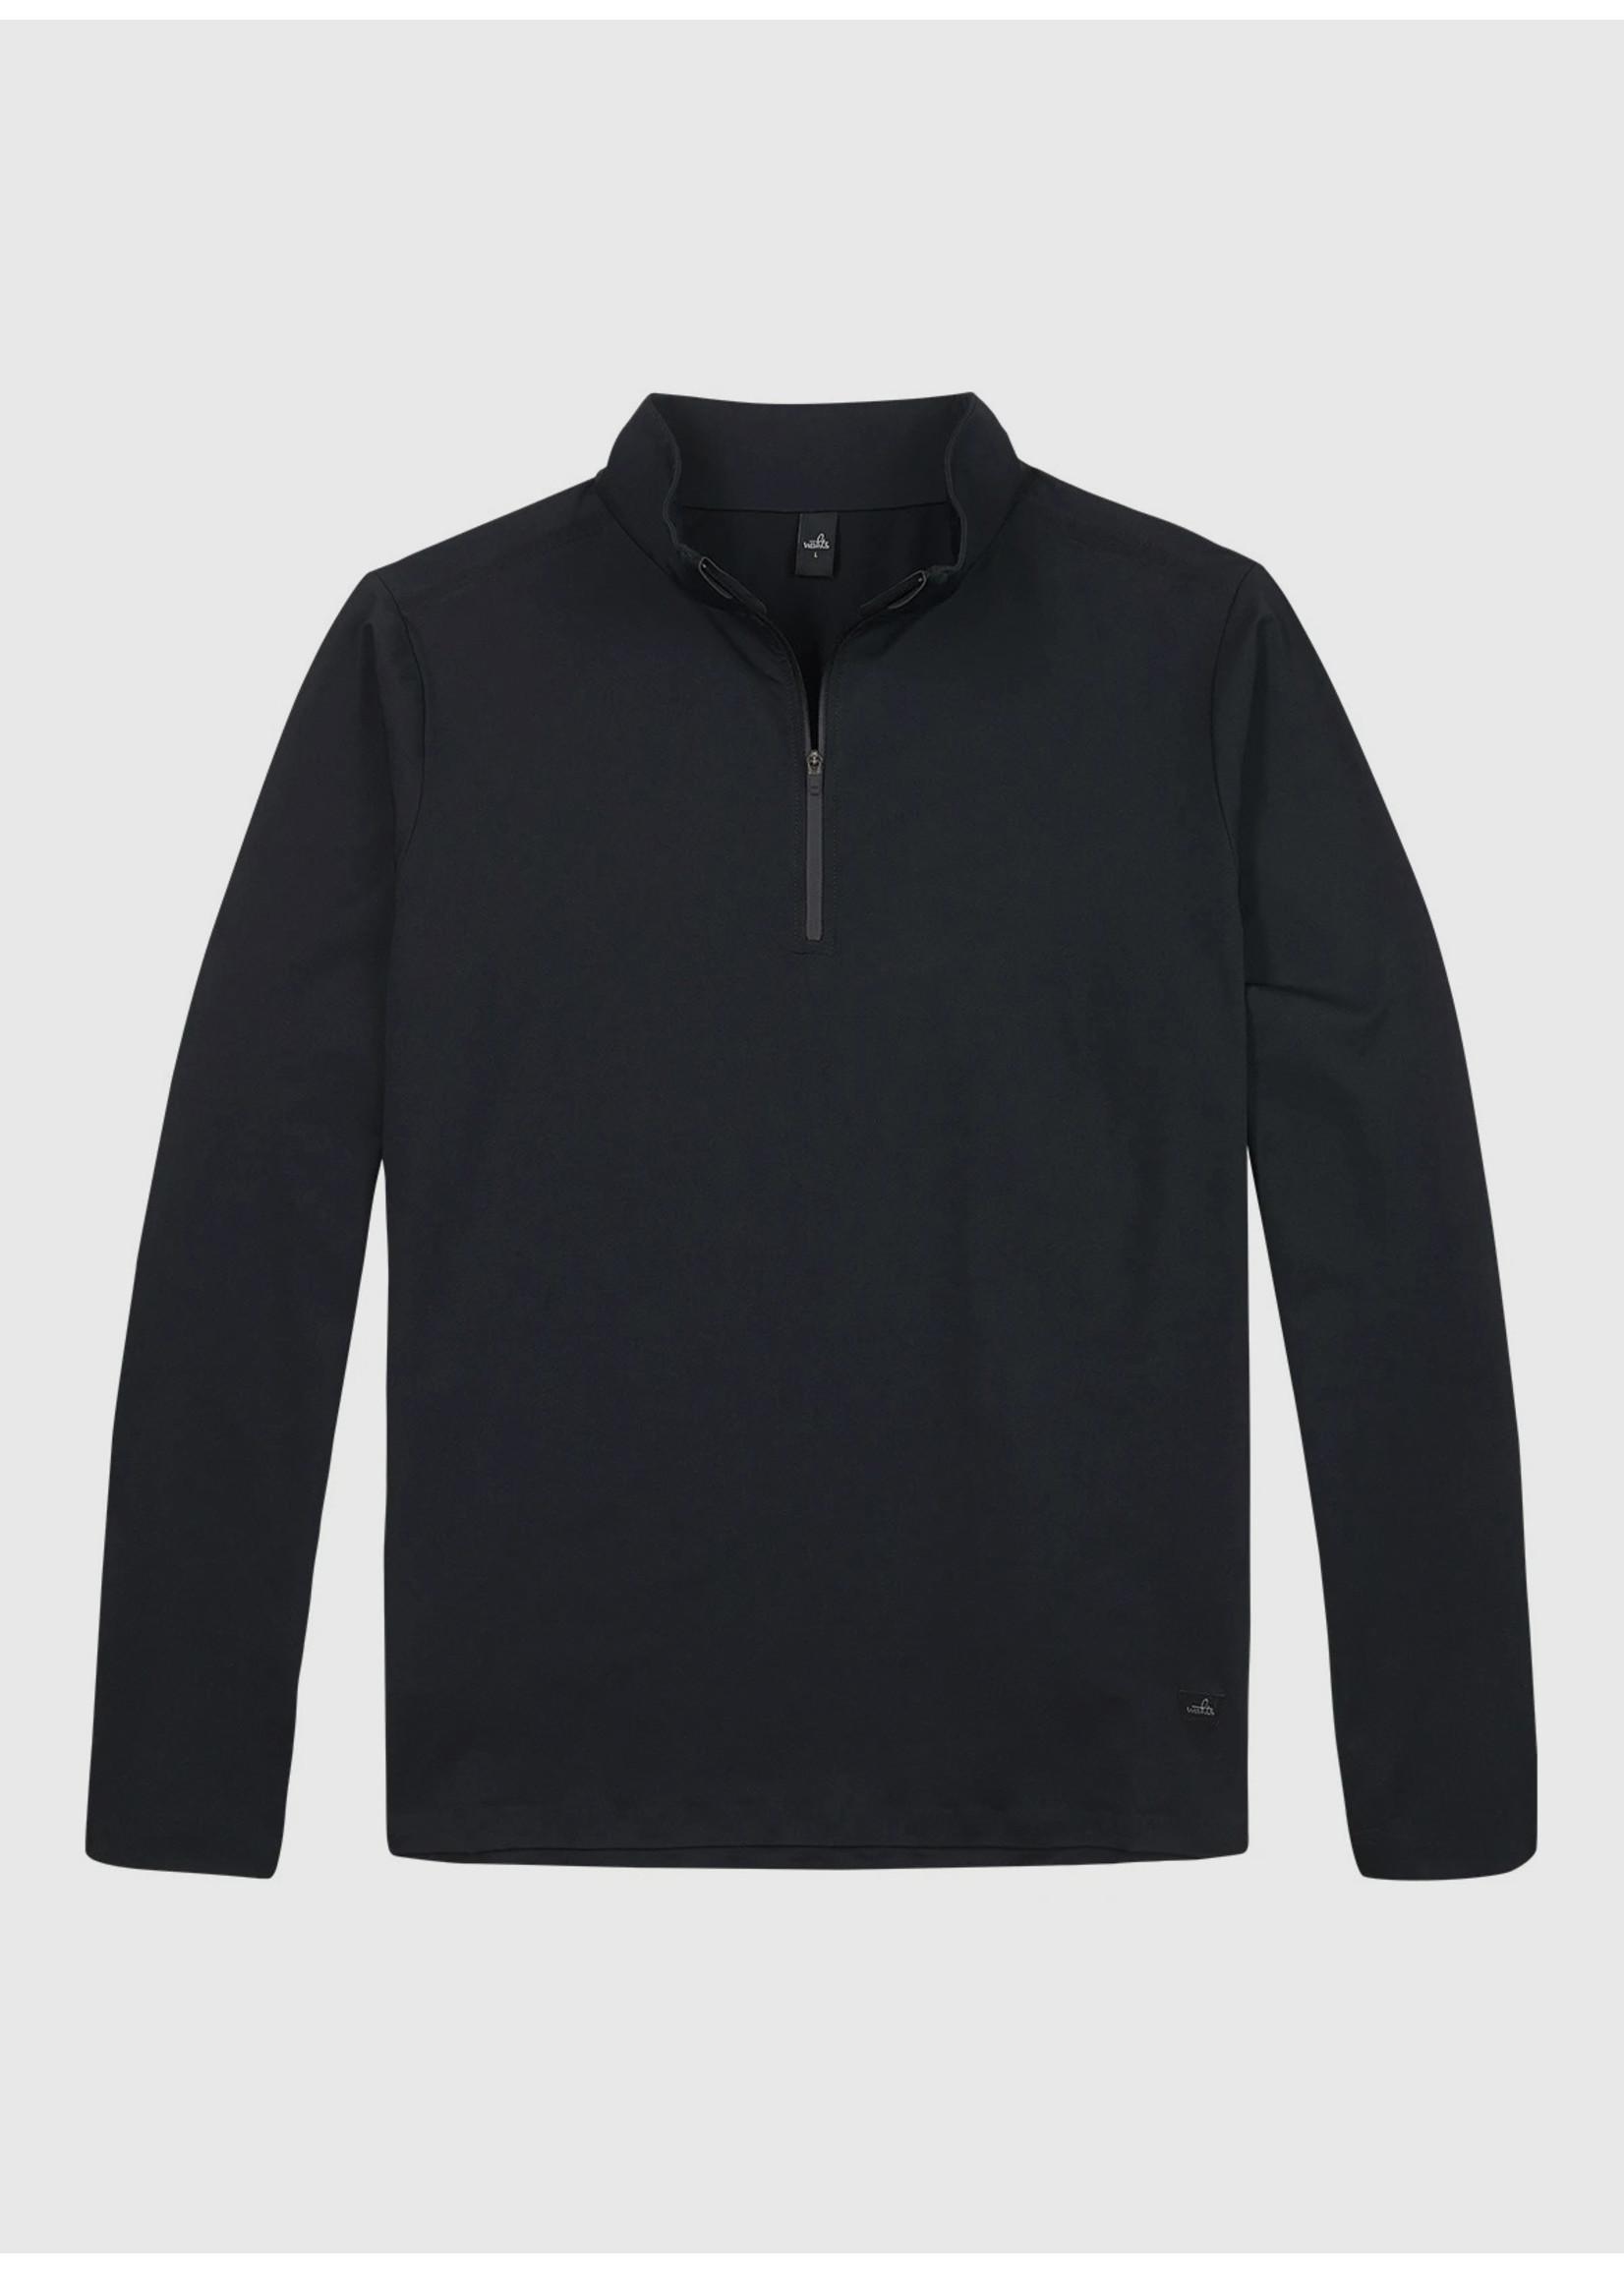 Wahts Cole cross sports half zip top carbon black